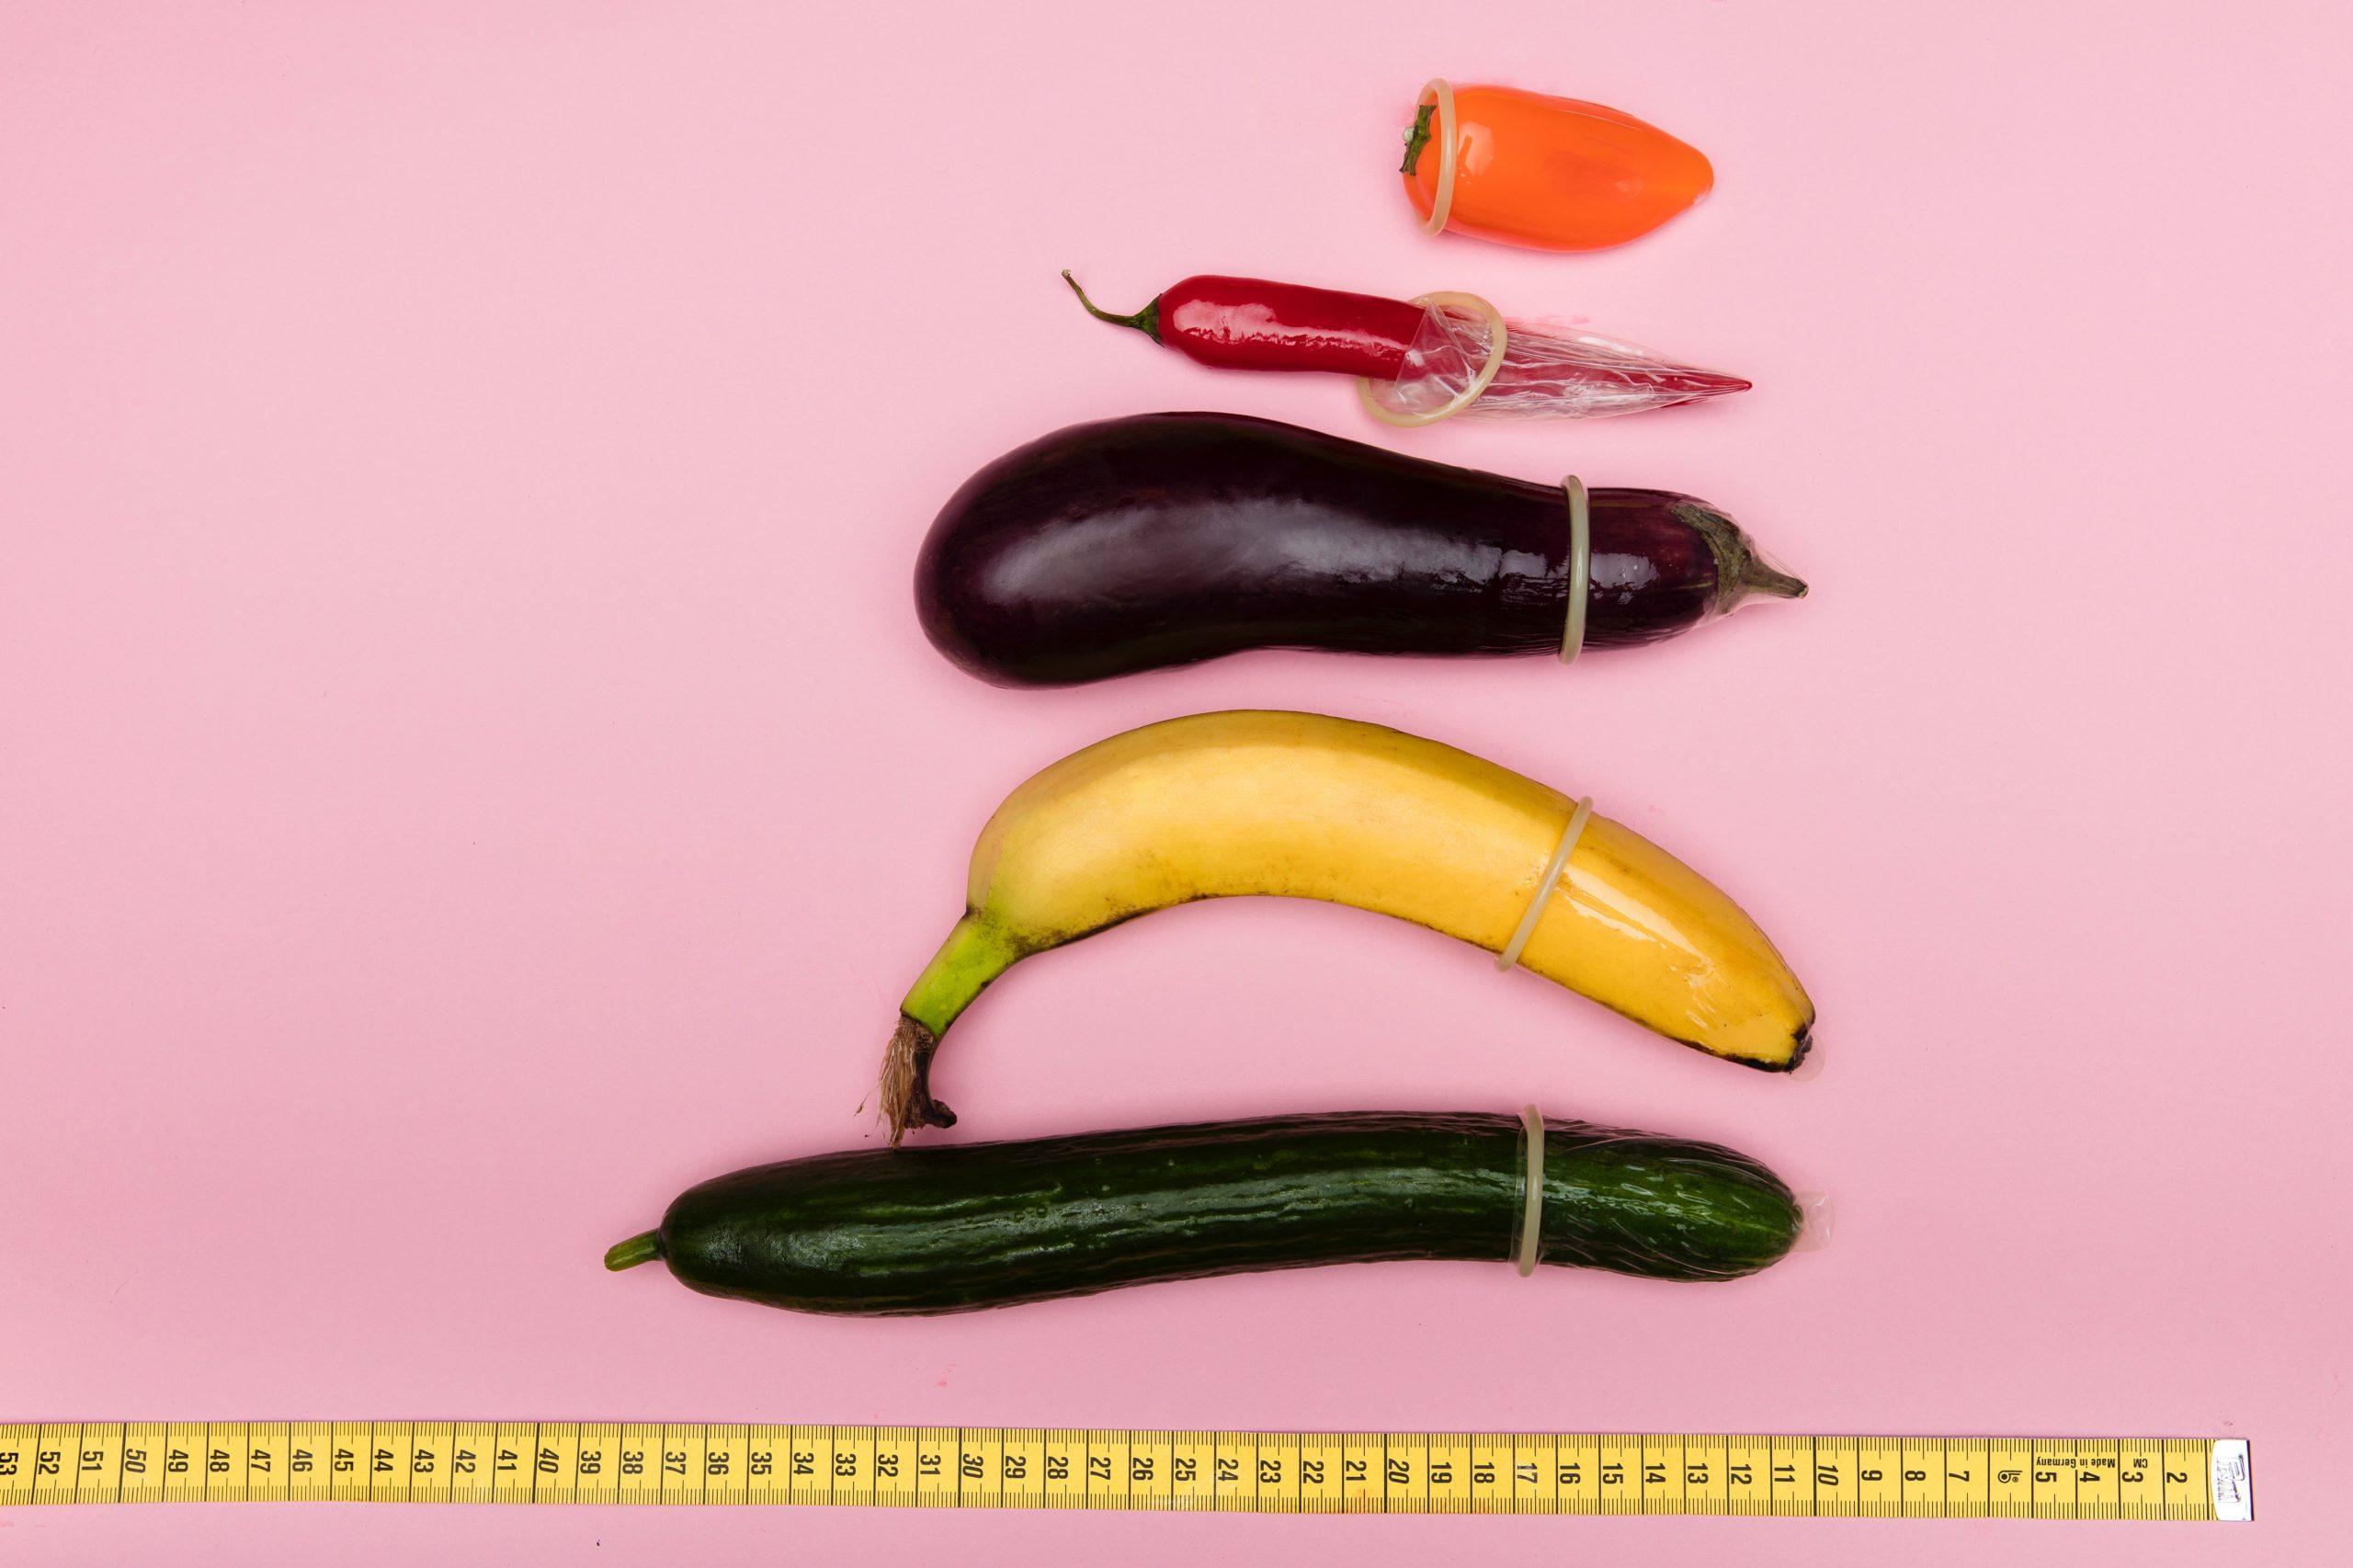 Aumento de pênis: Como funciona a cirurgia?